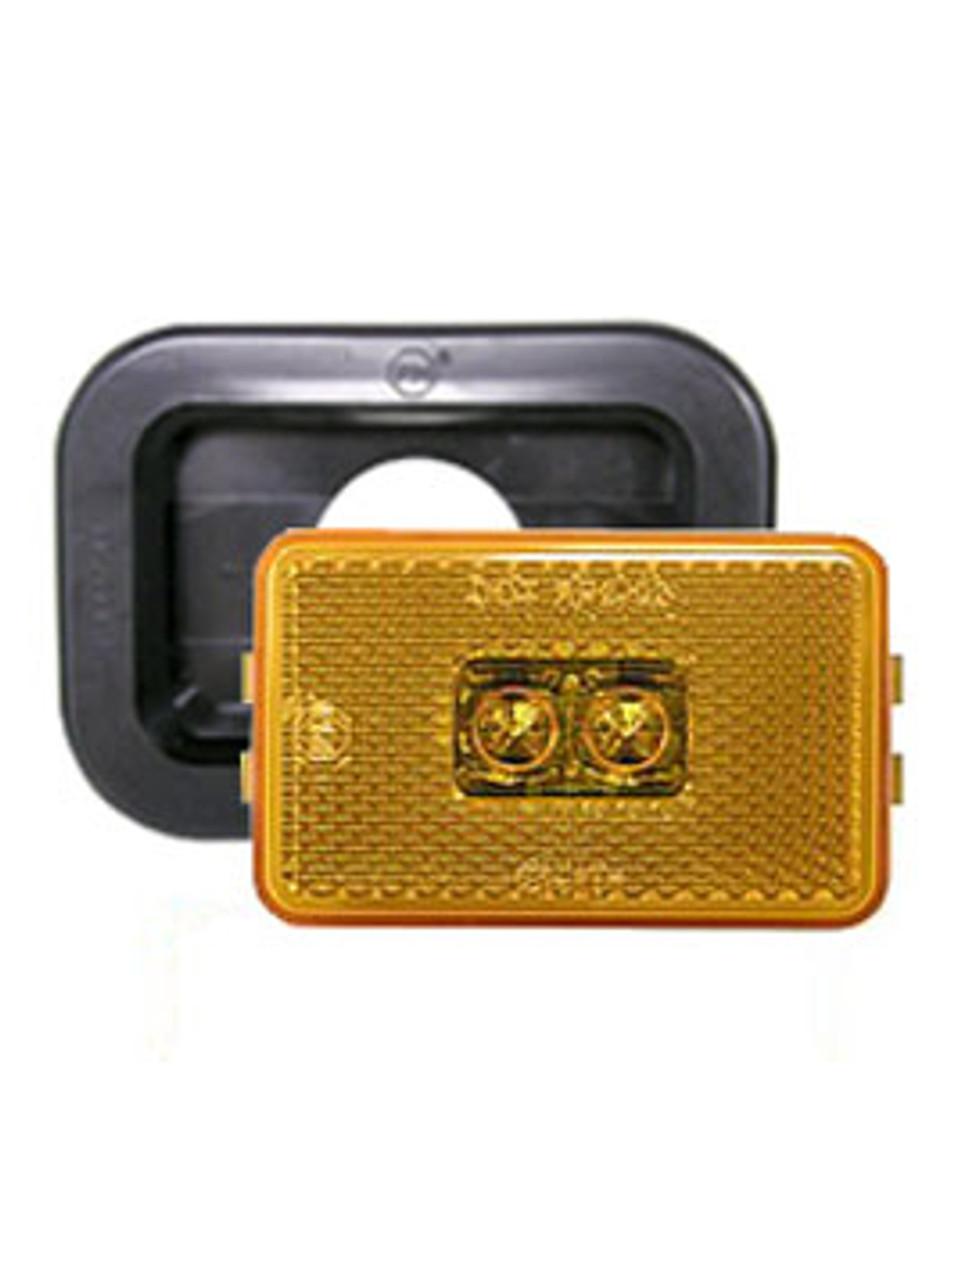 LED129KA2 --- LED Rectangular Sealed Clearance/Side Marker Light Kit - Amber